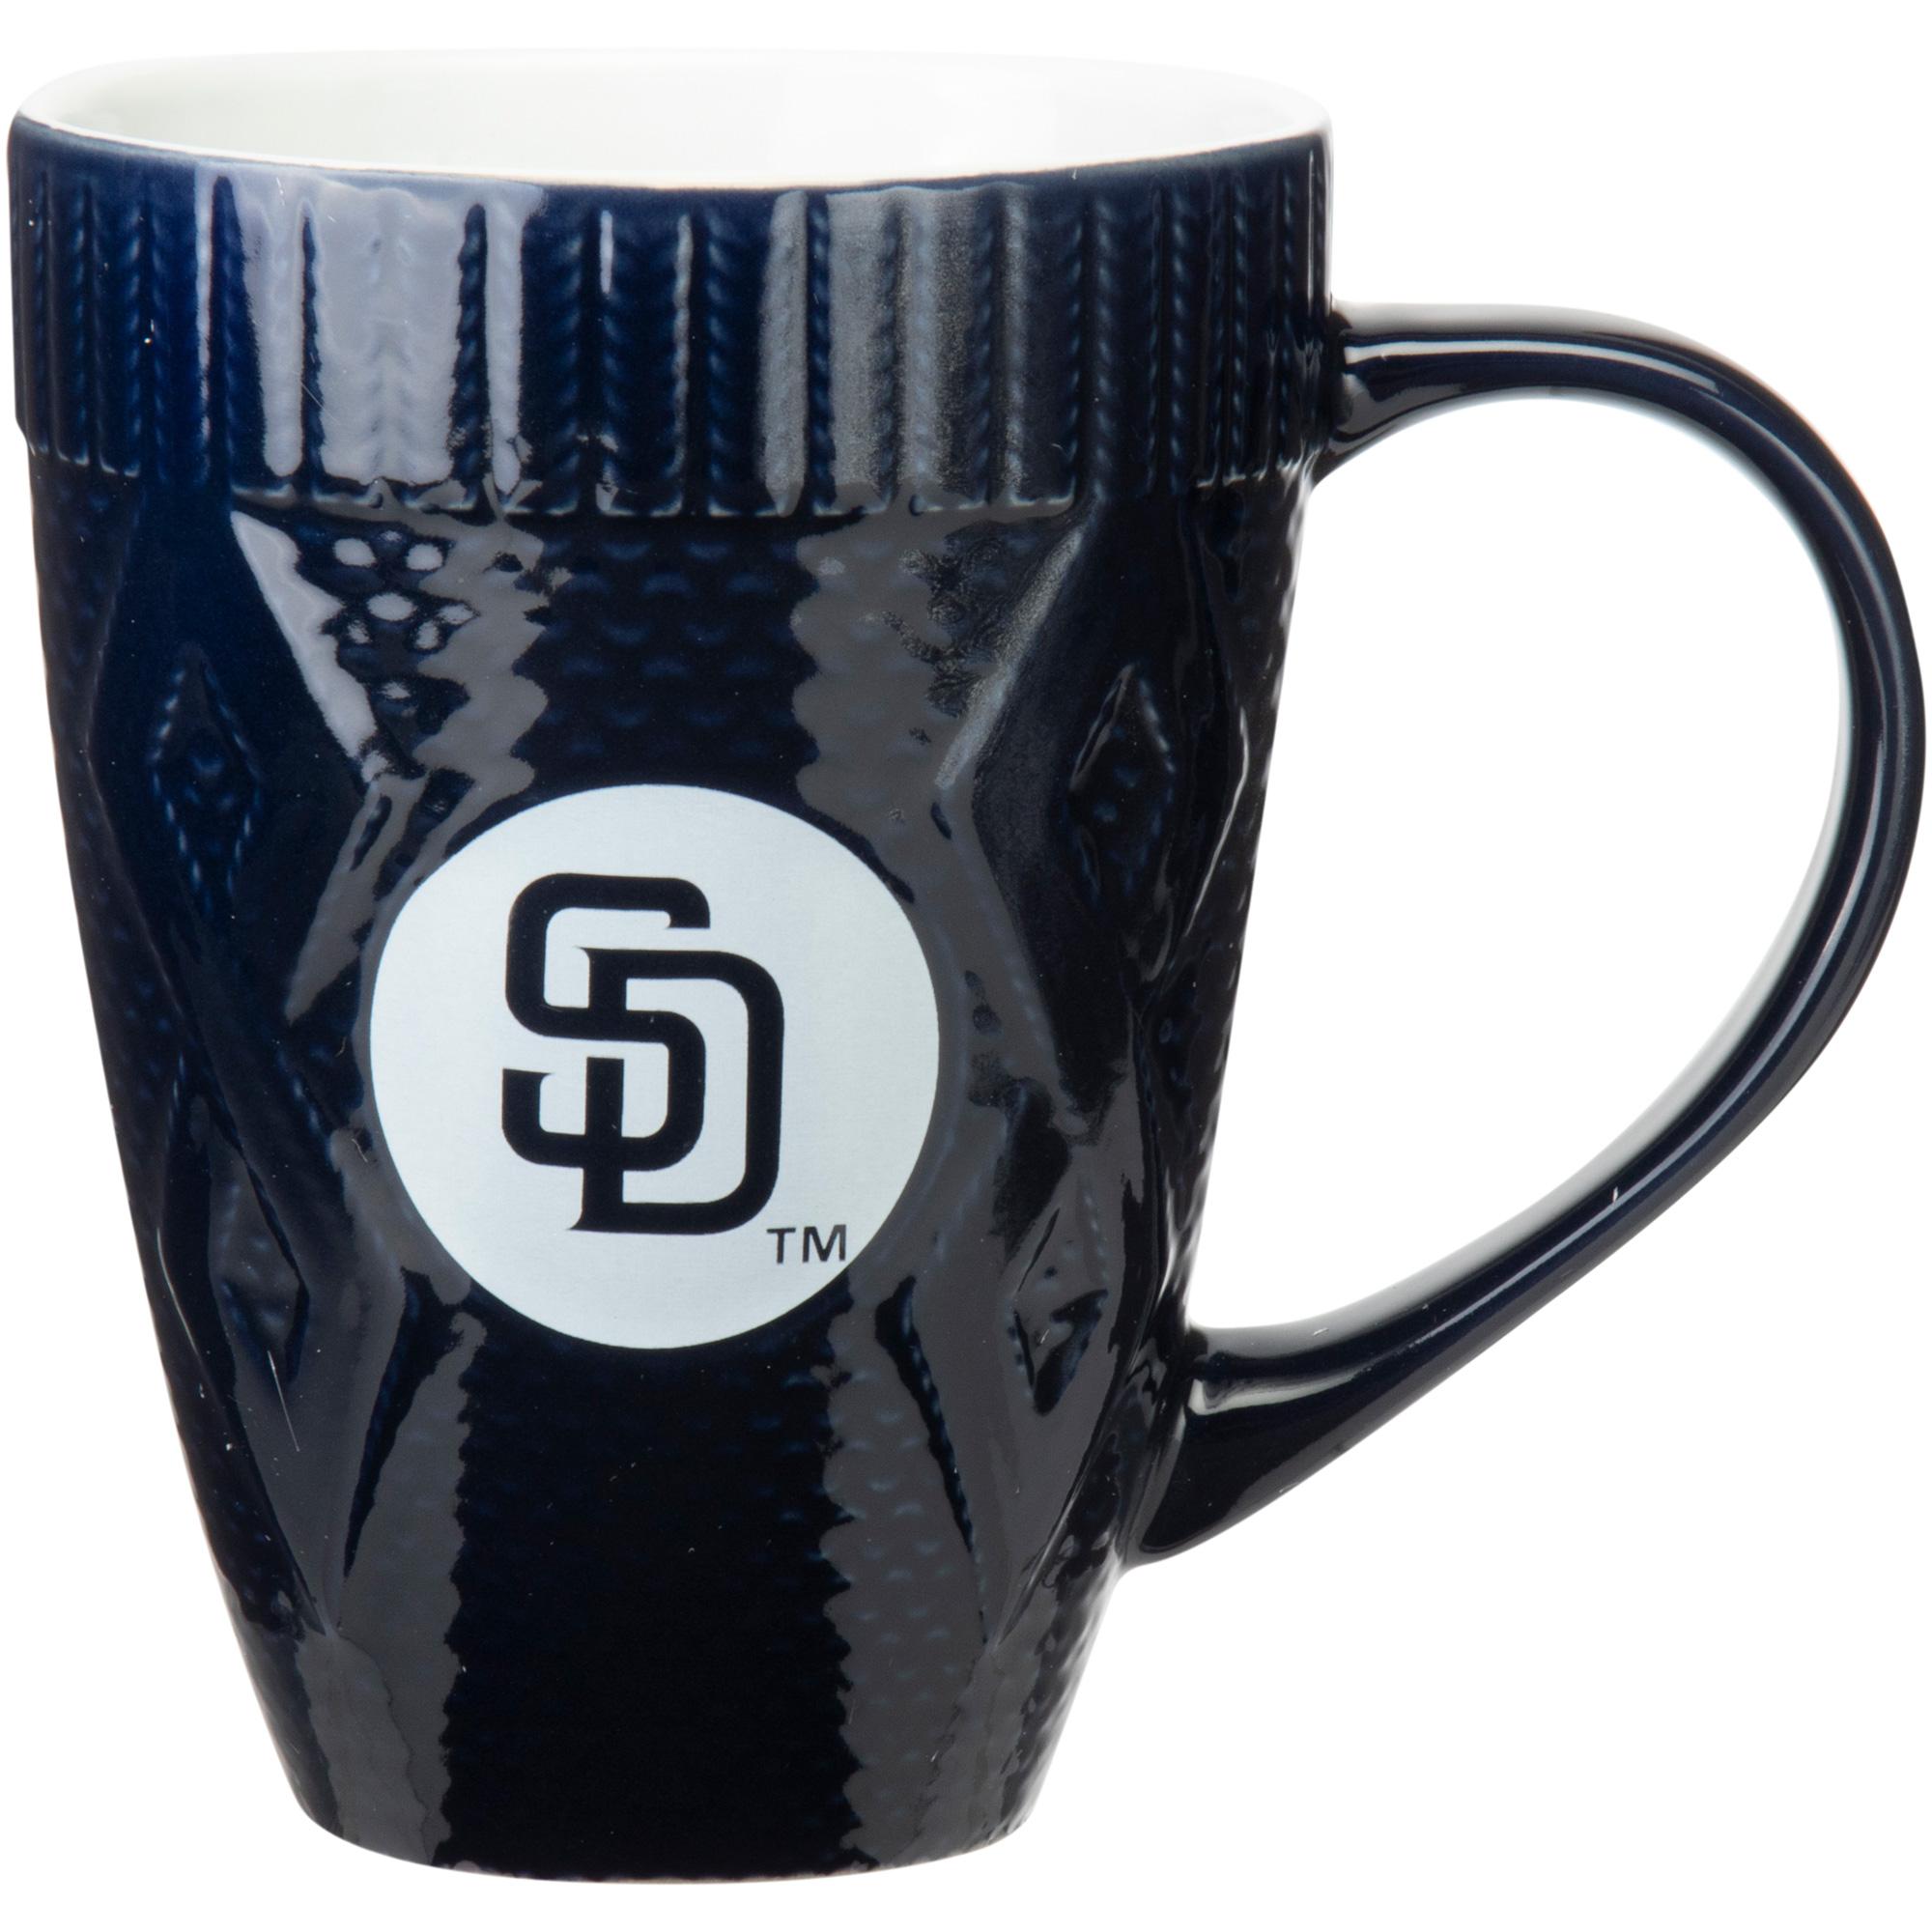 San Diego Padres 16oz. Sweater Mug - No Size